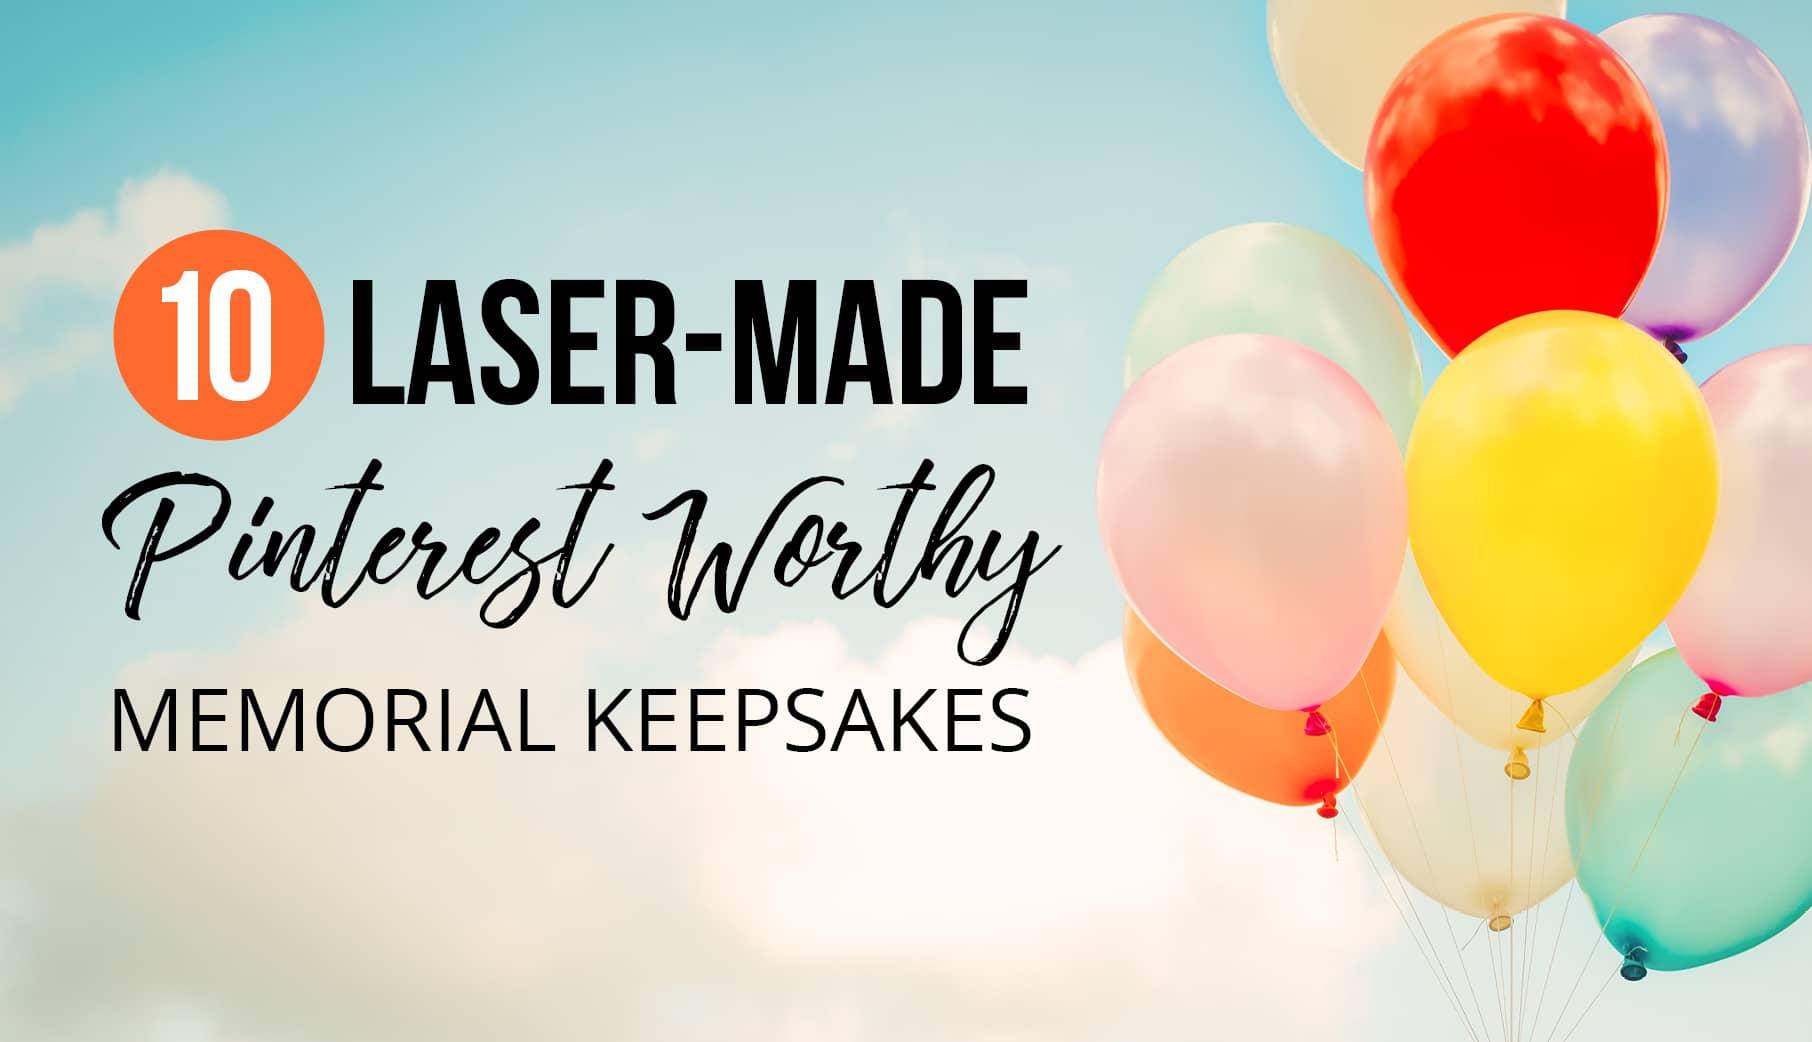 10 Laser-Made Pinterest Worthy Memorial Keepsakes